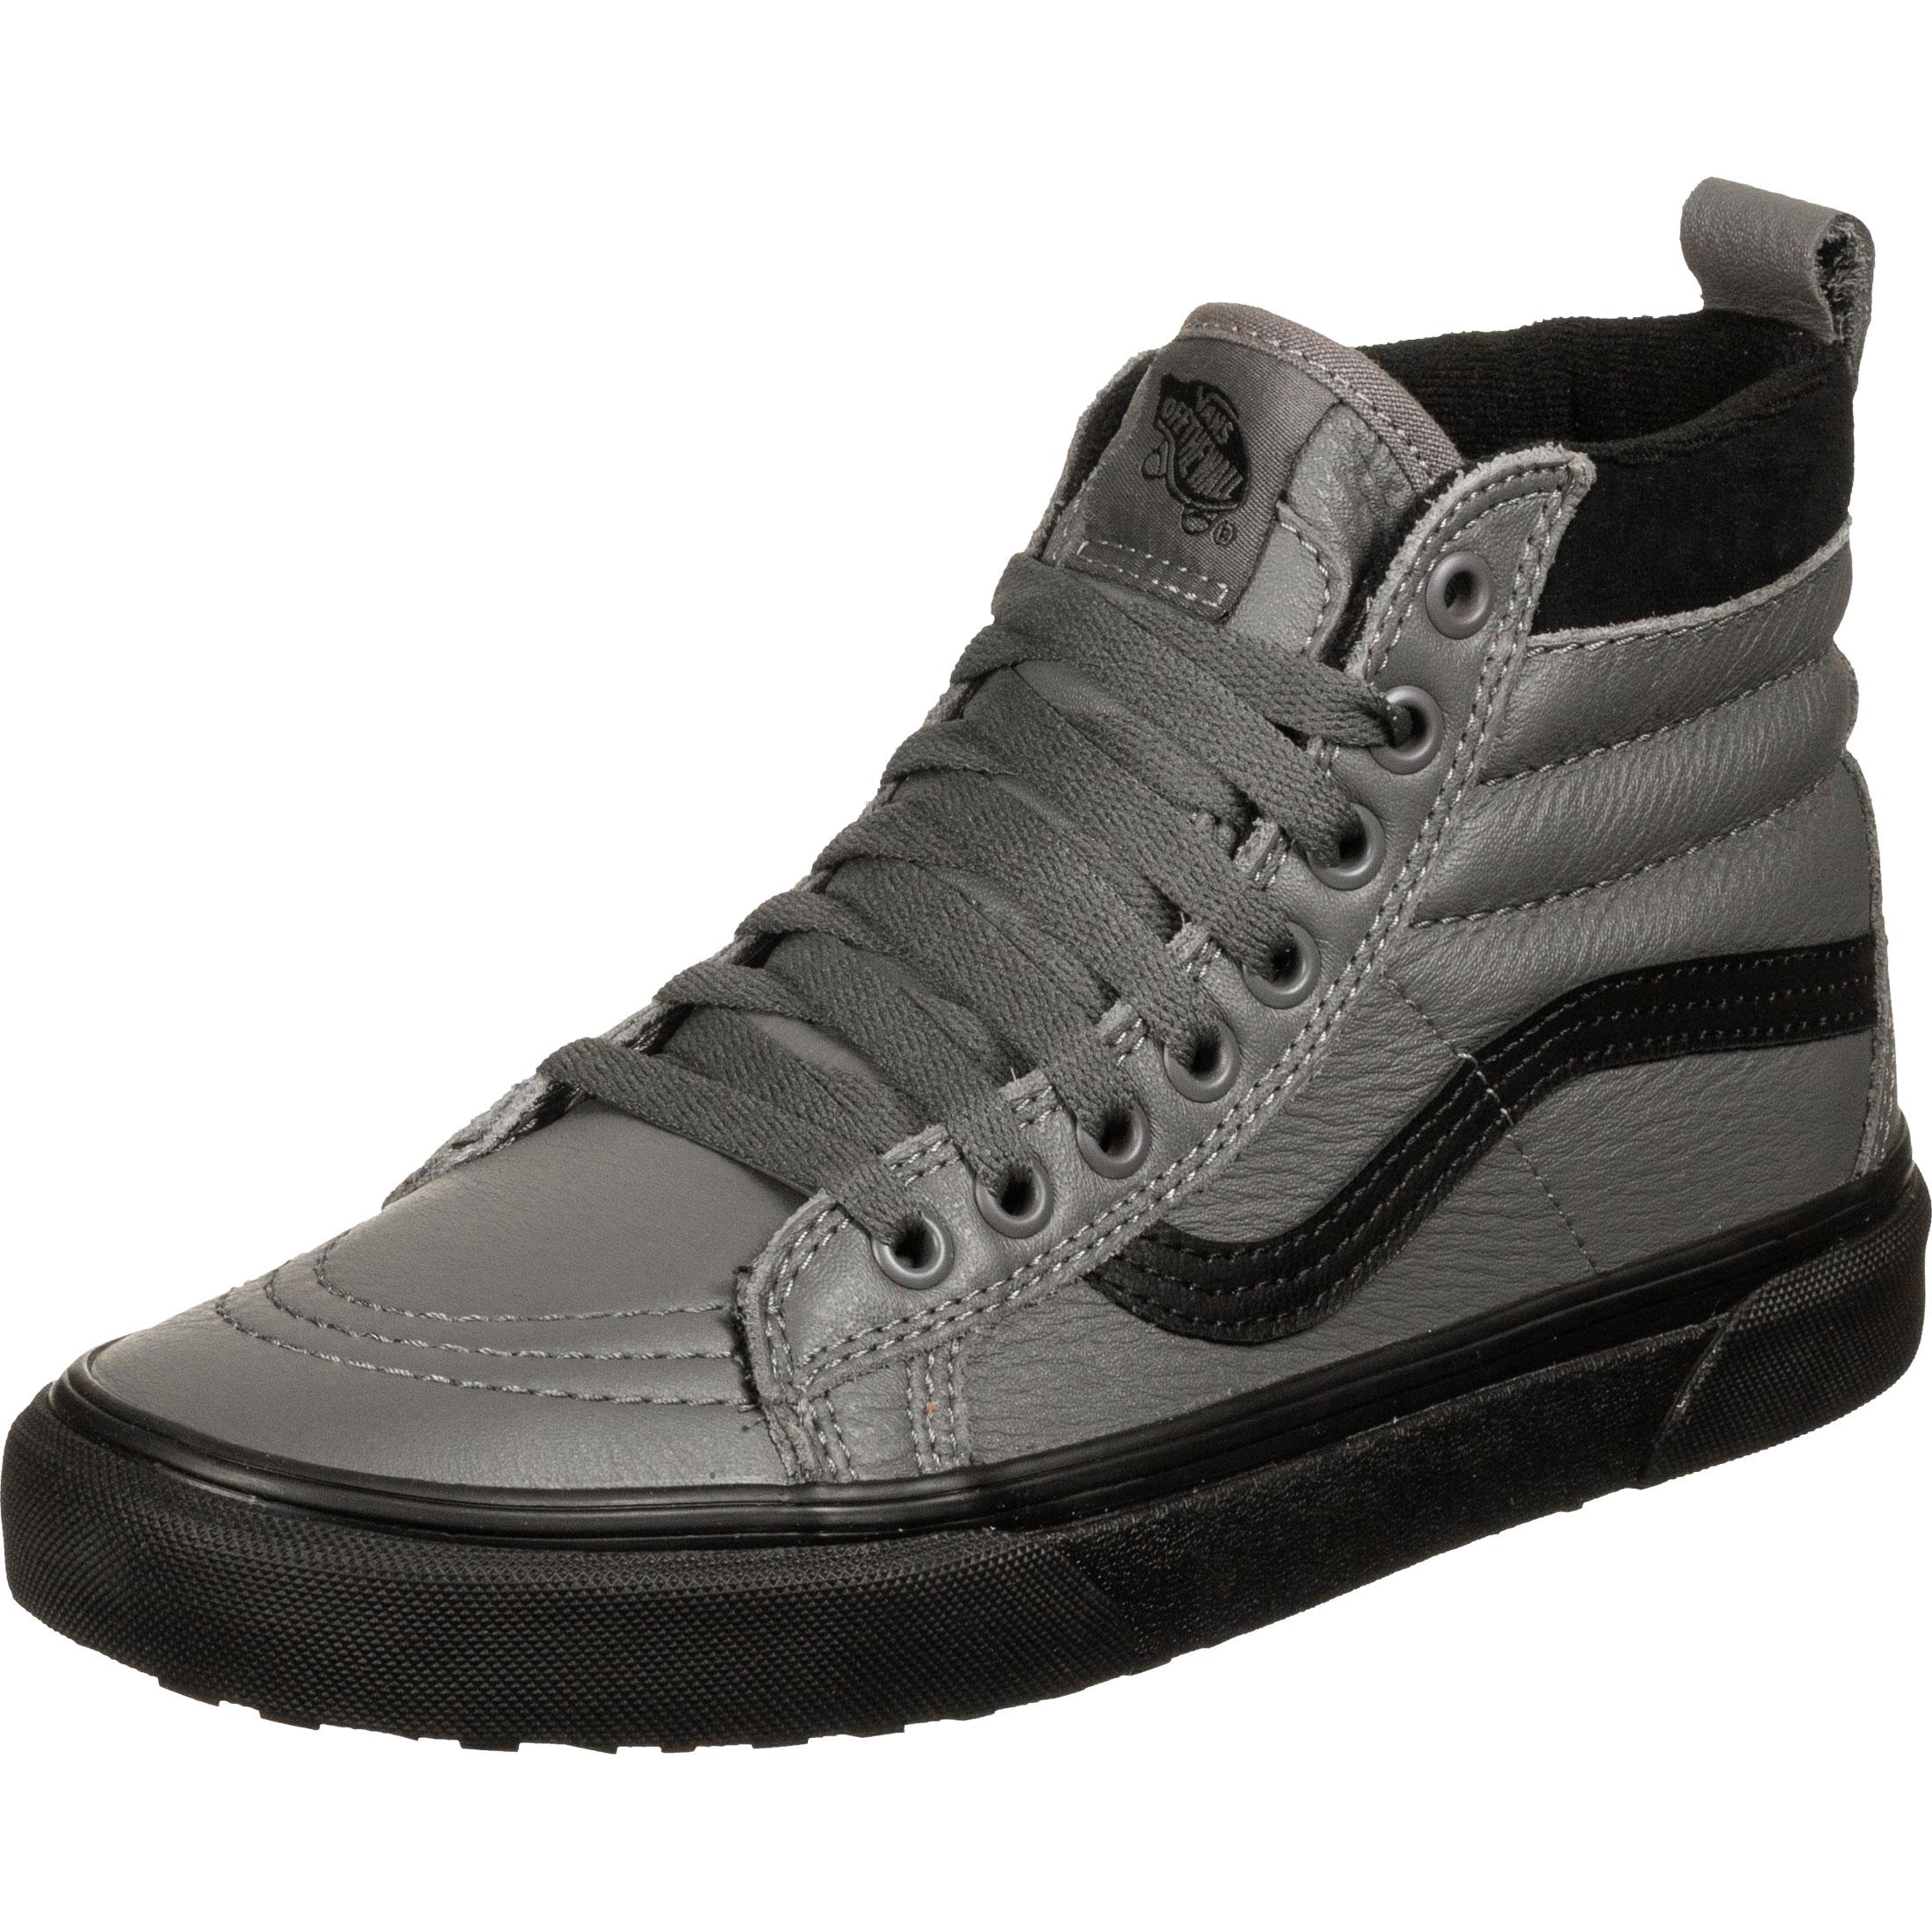 Vans SK8-Hi MTE - Sneakers High at